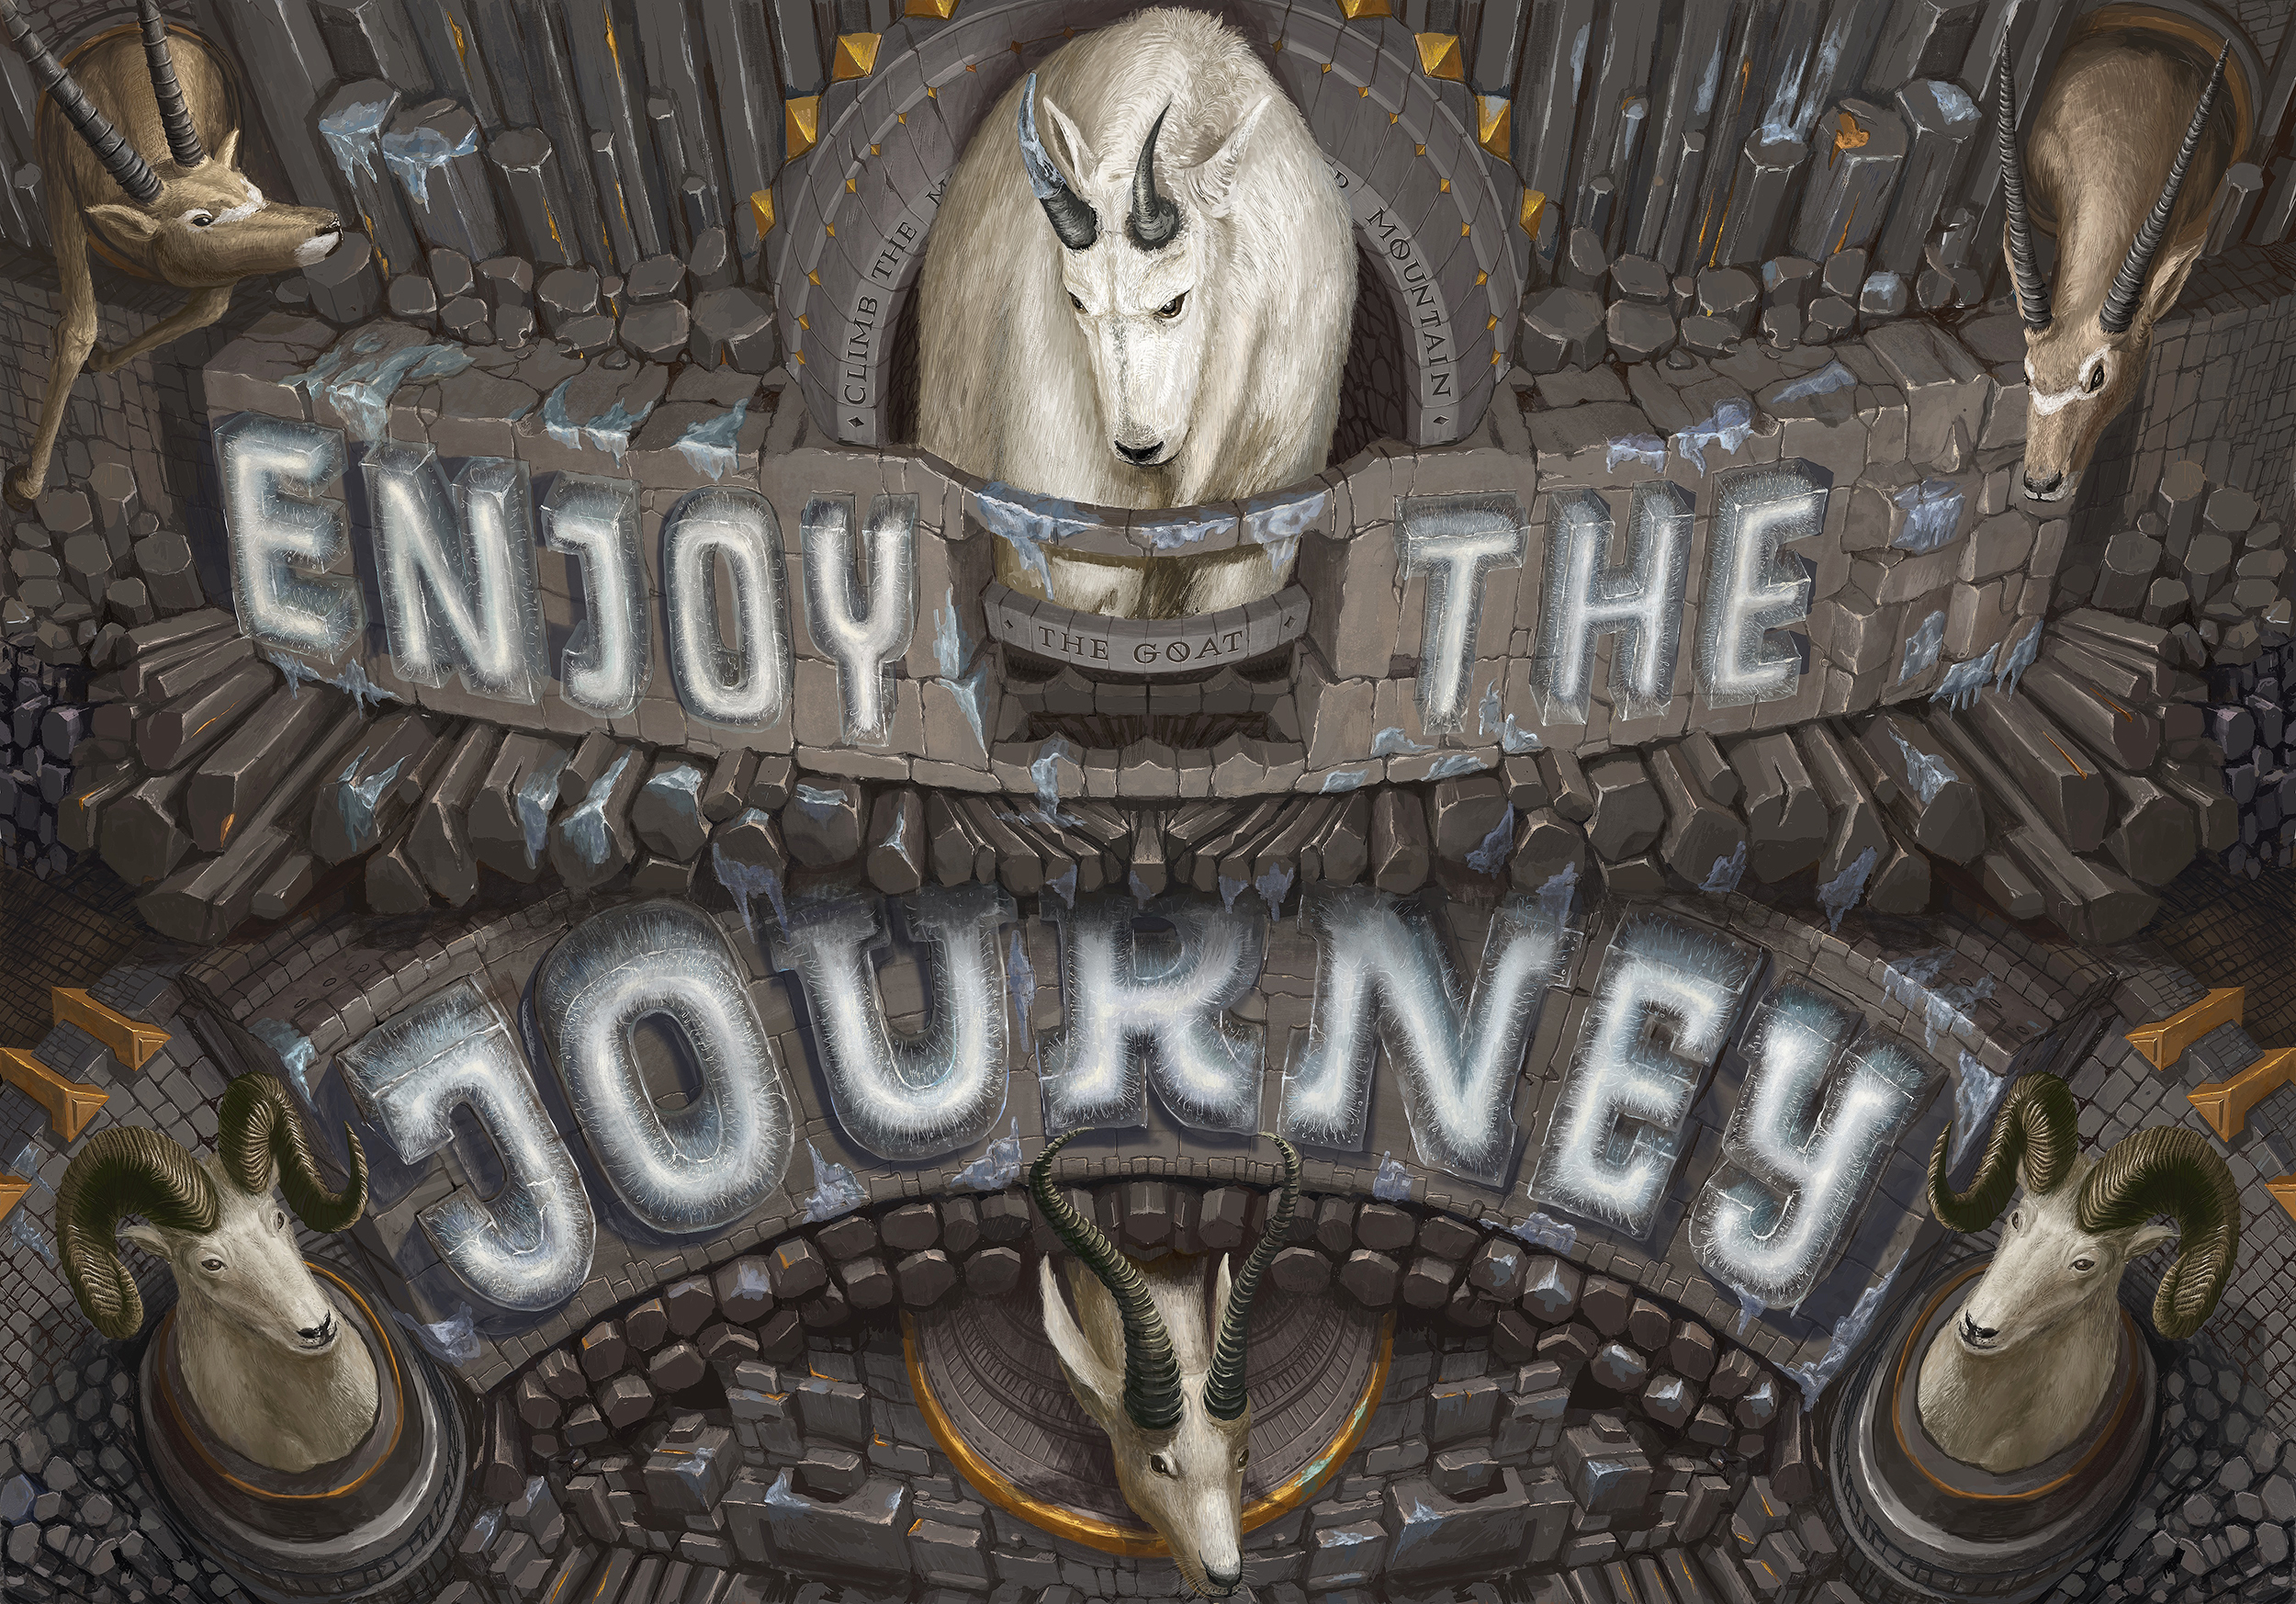 Enjoy_The_Journey2k.jpg